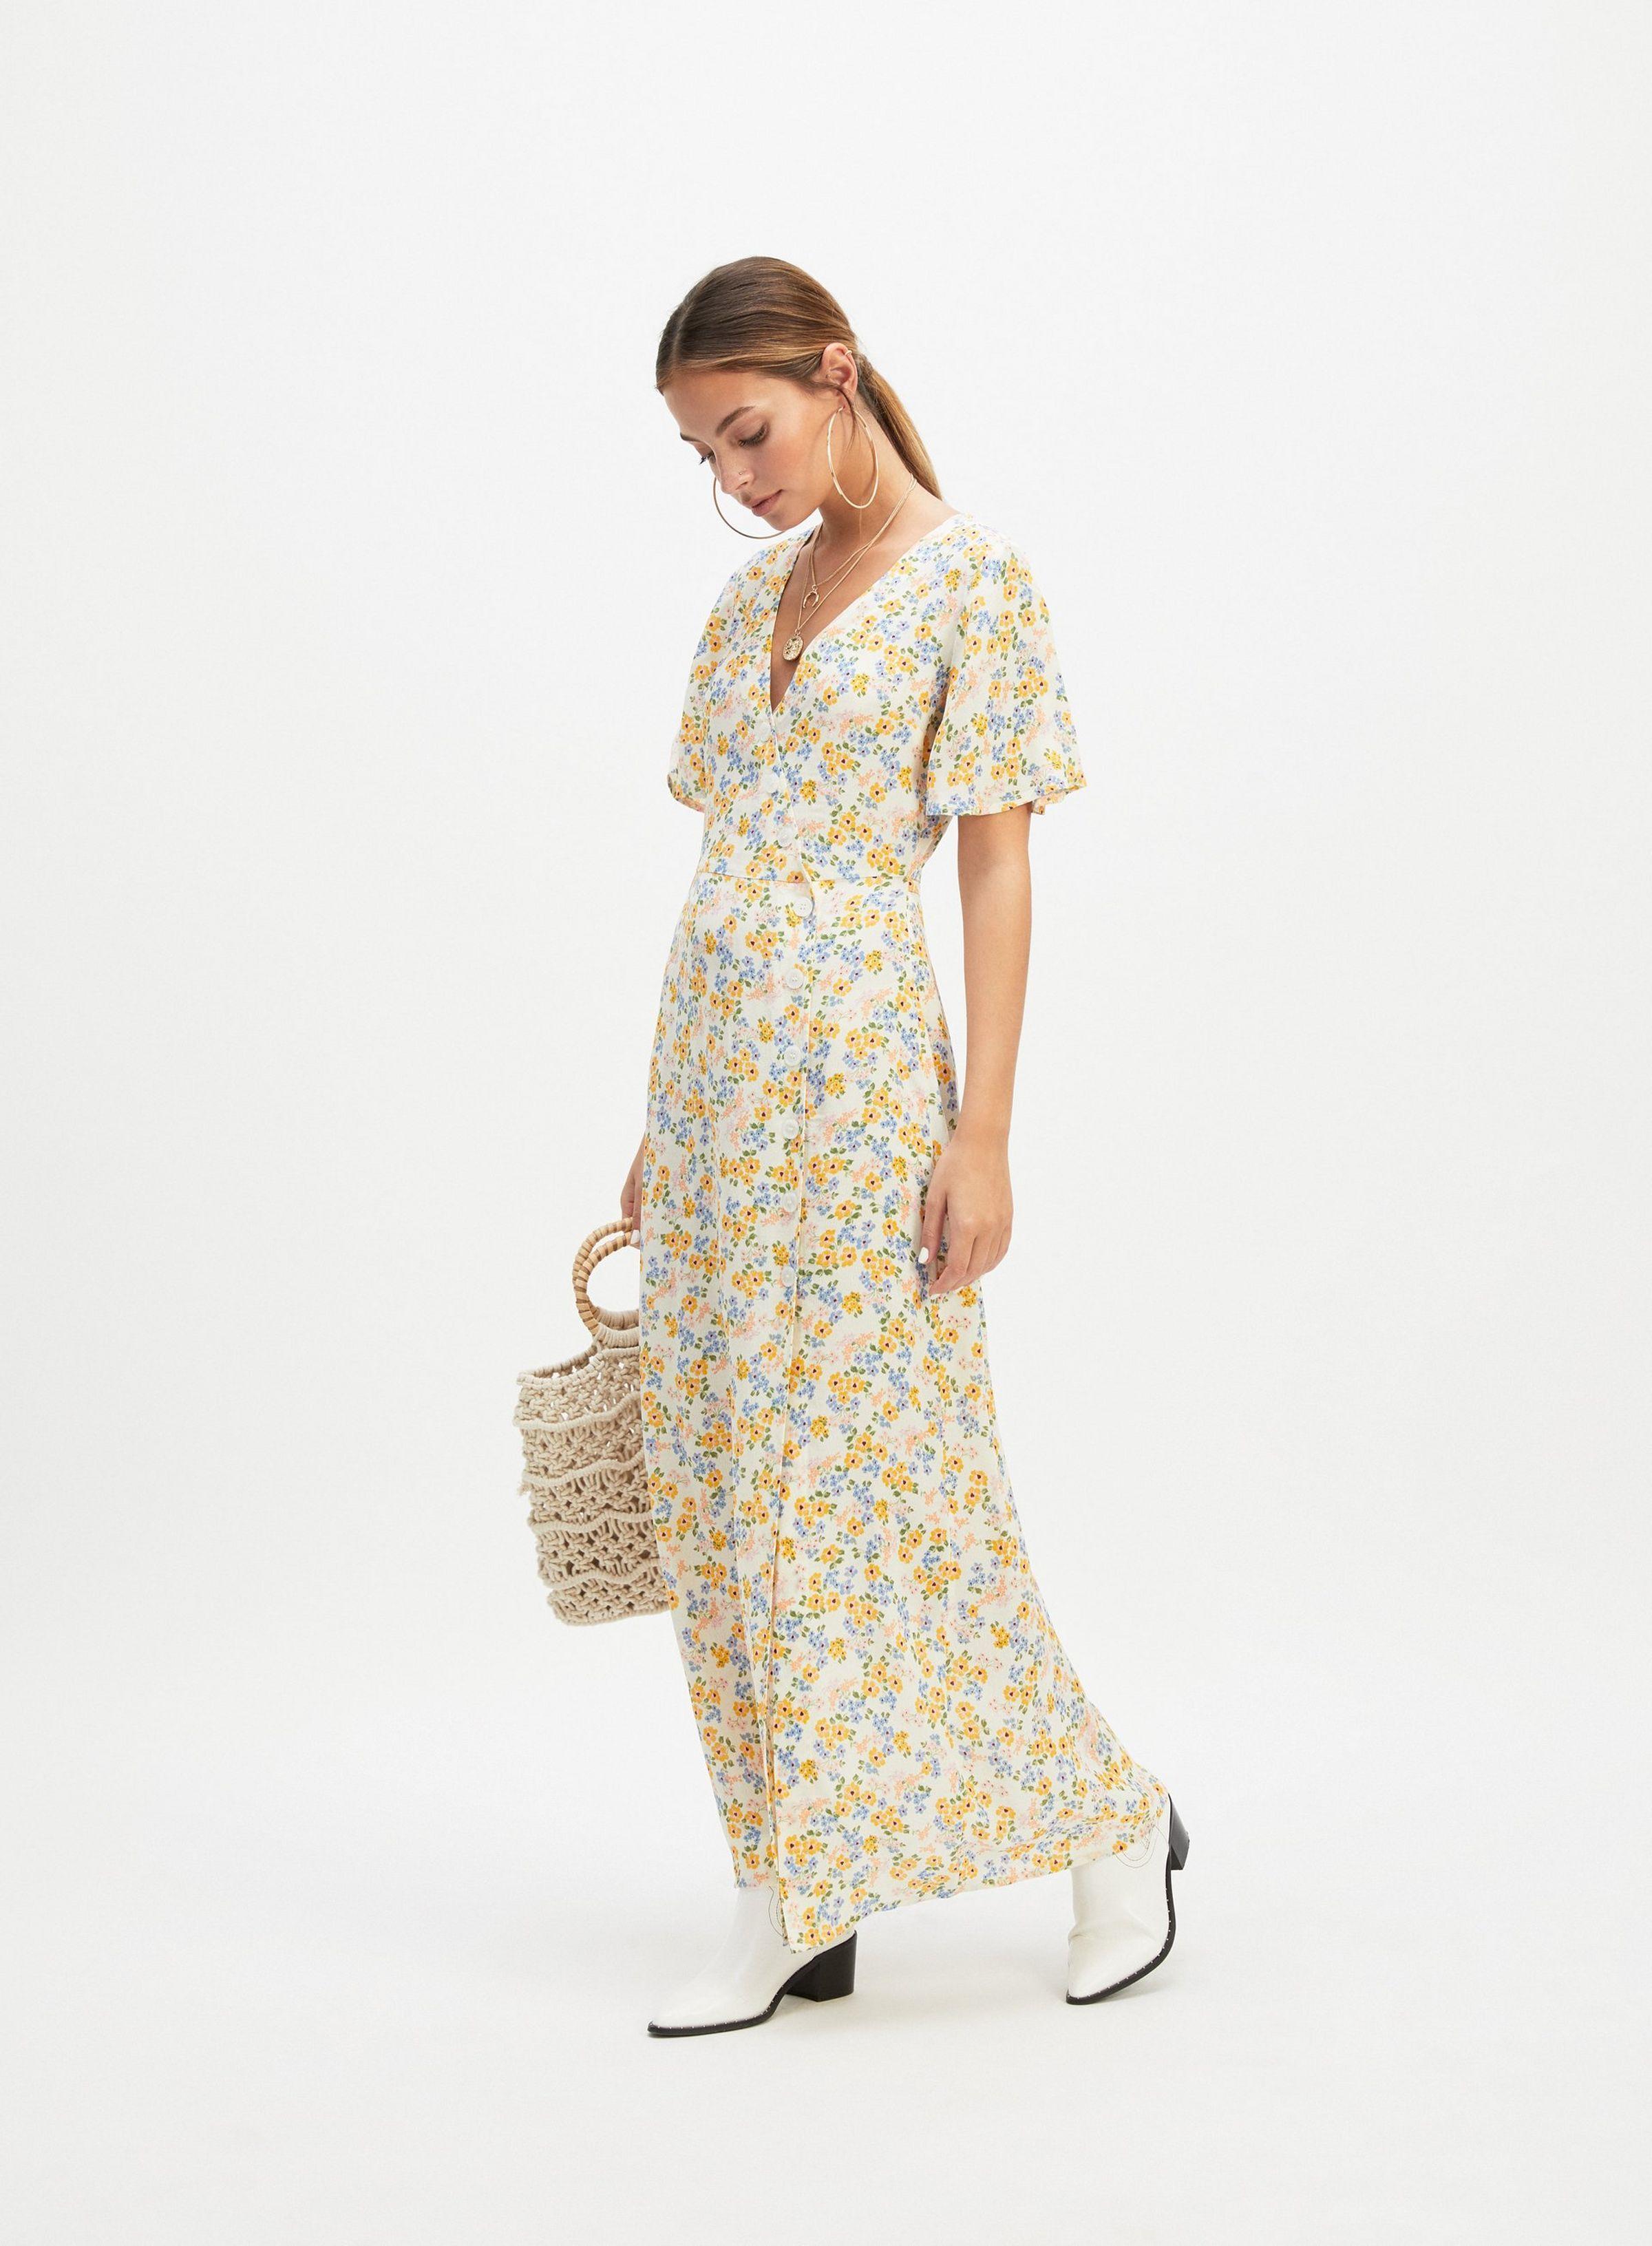 bdcc7cf056cd Carousel Image 0 Petite Dresses, Ditsy, Miss Selfridge, Short Sleeve Dresses